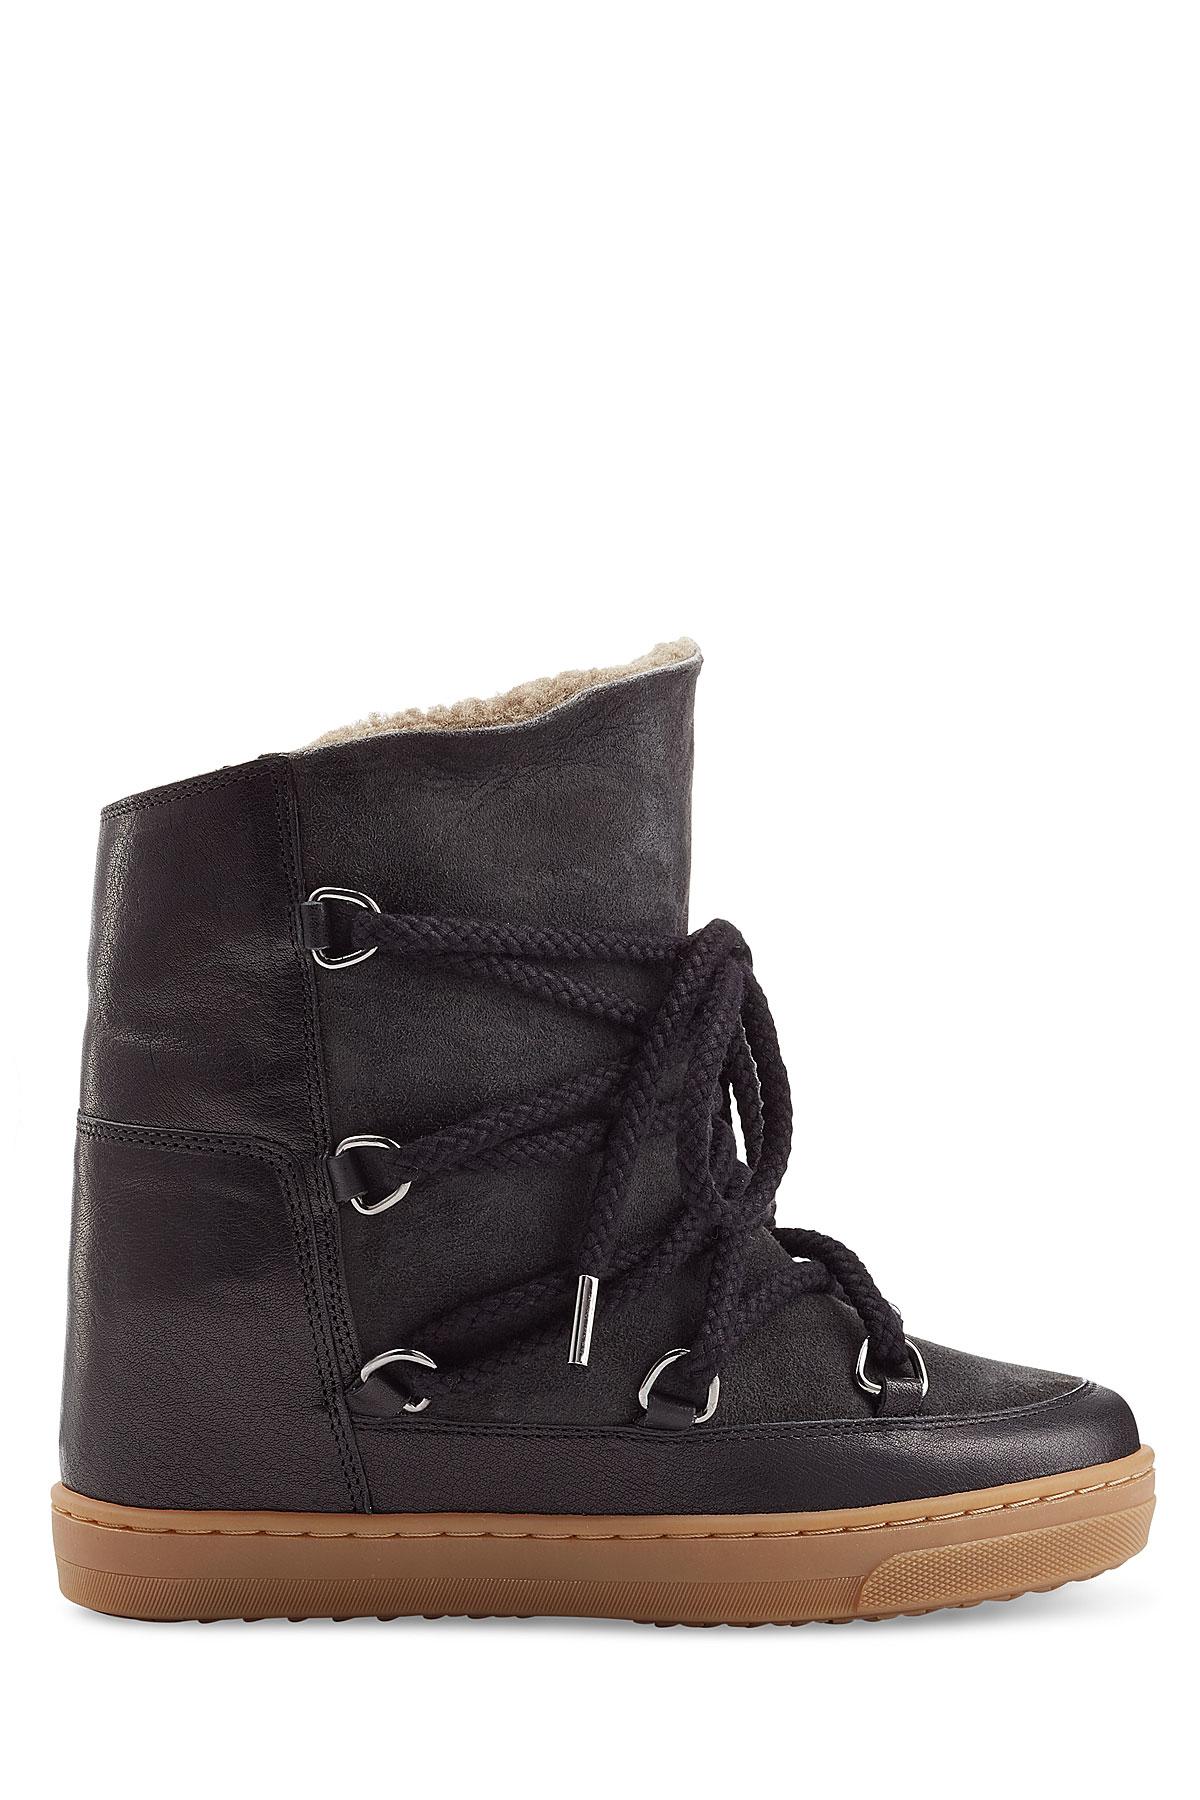 toile isabel marant nowles ankle boots black in black lyst. Black Bedroom Furniture Sets. Home Design Ideas